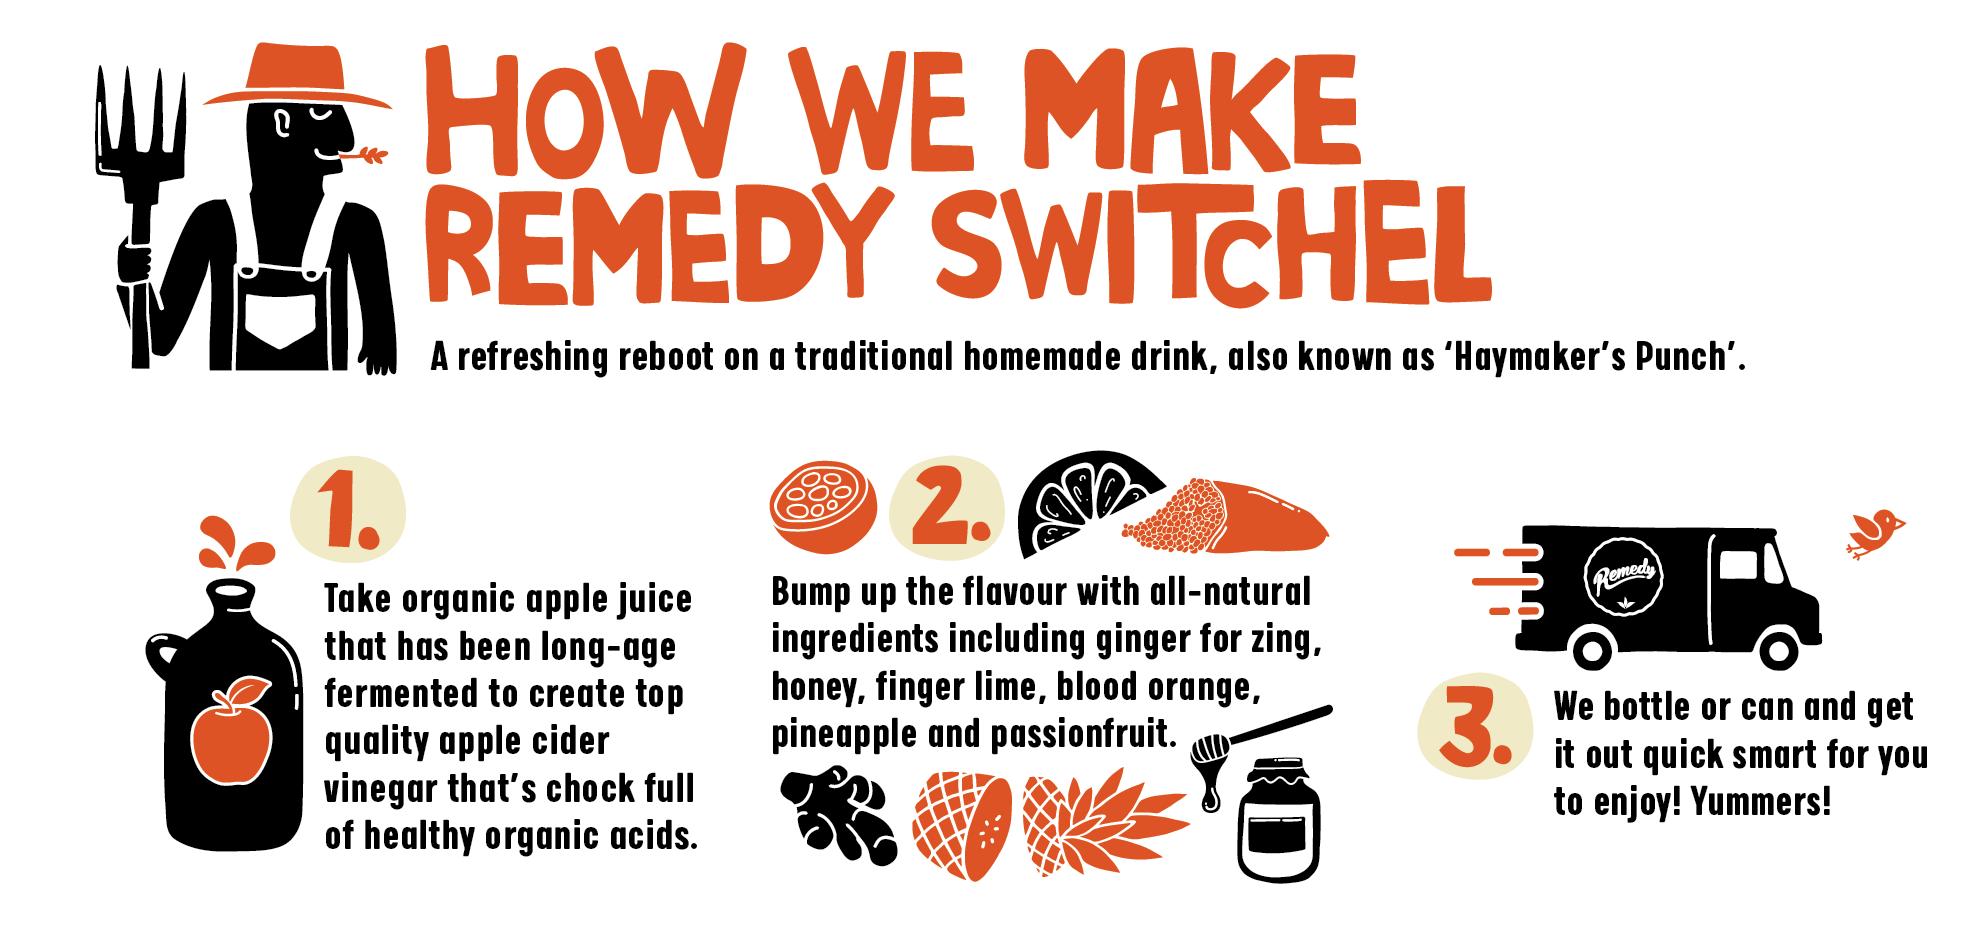 Remedy Switchel Brewing Process